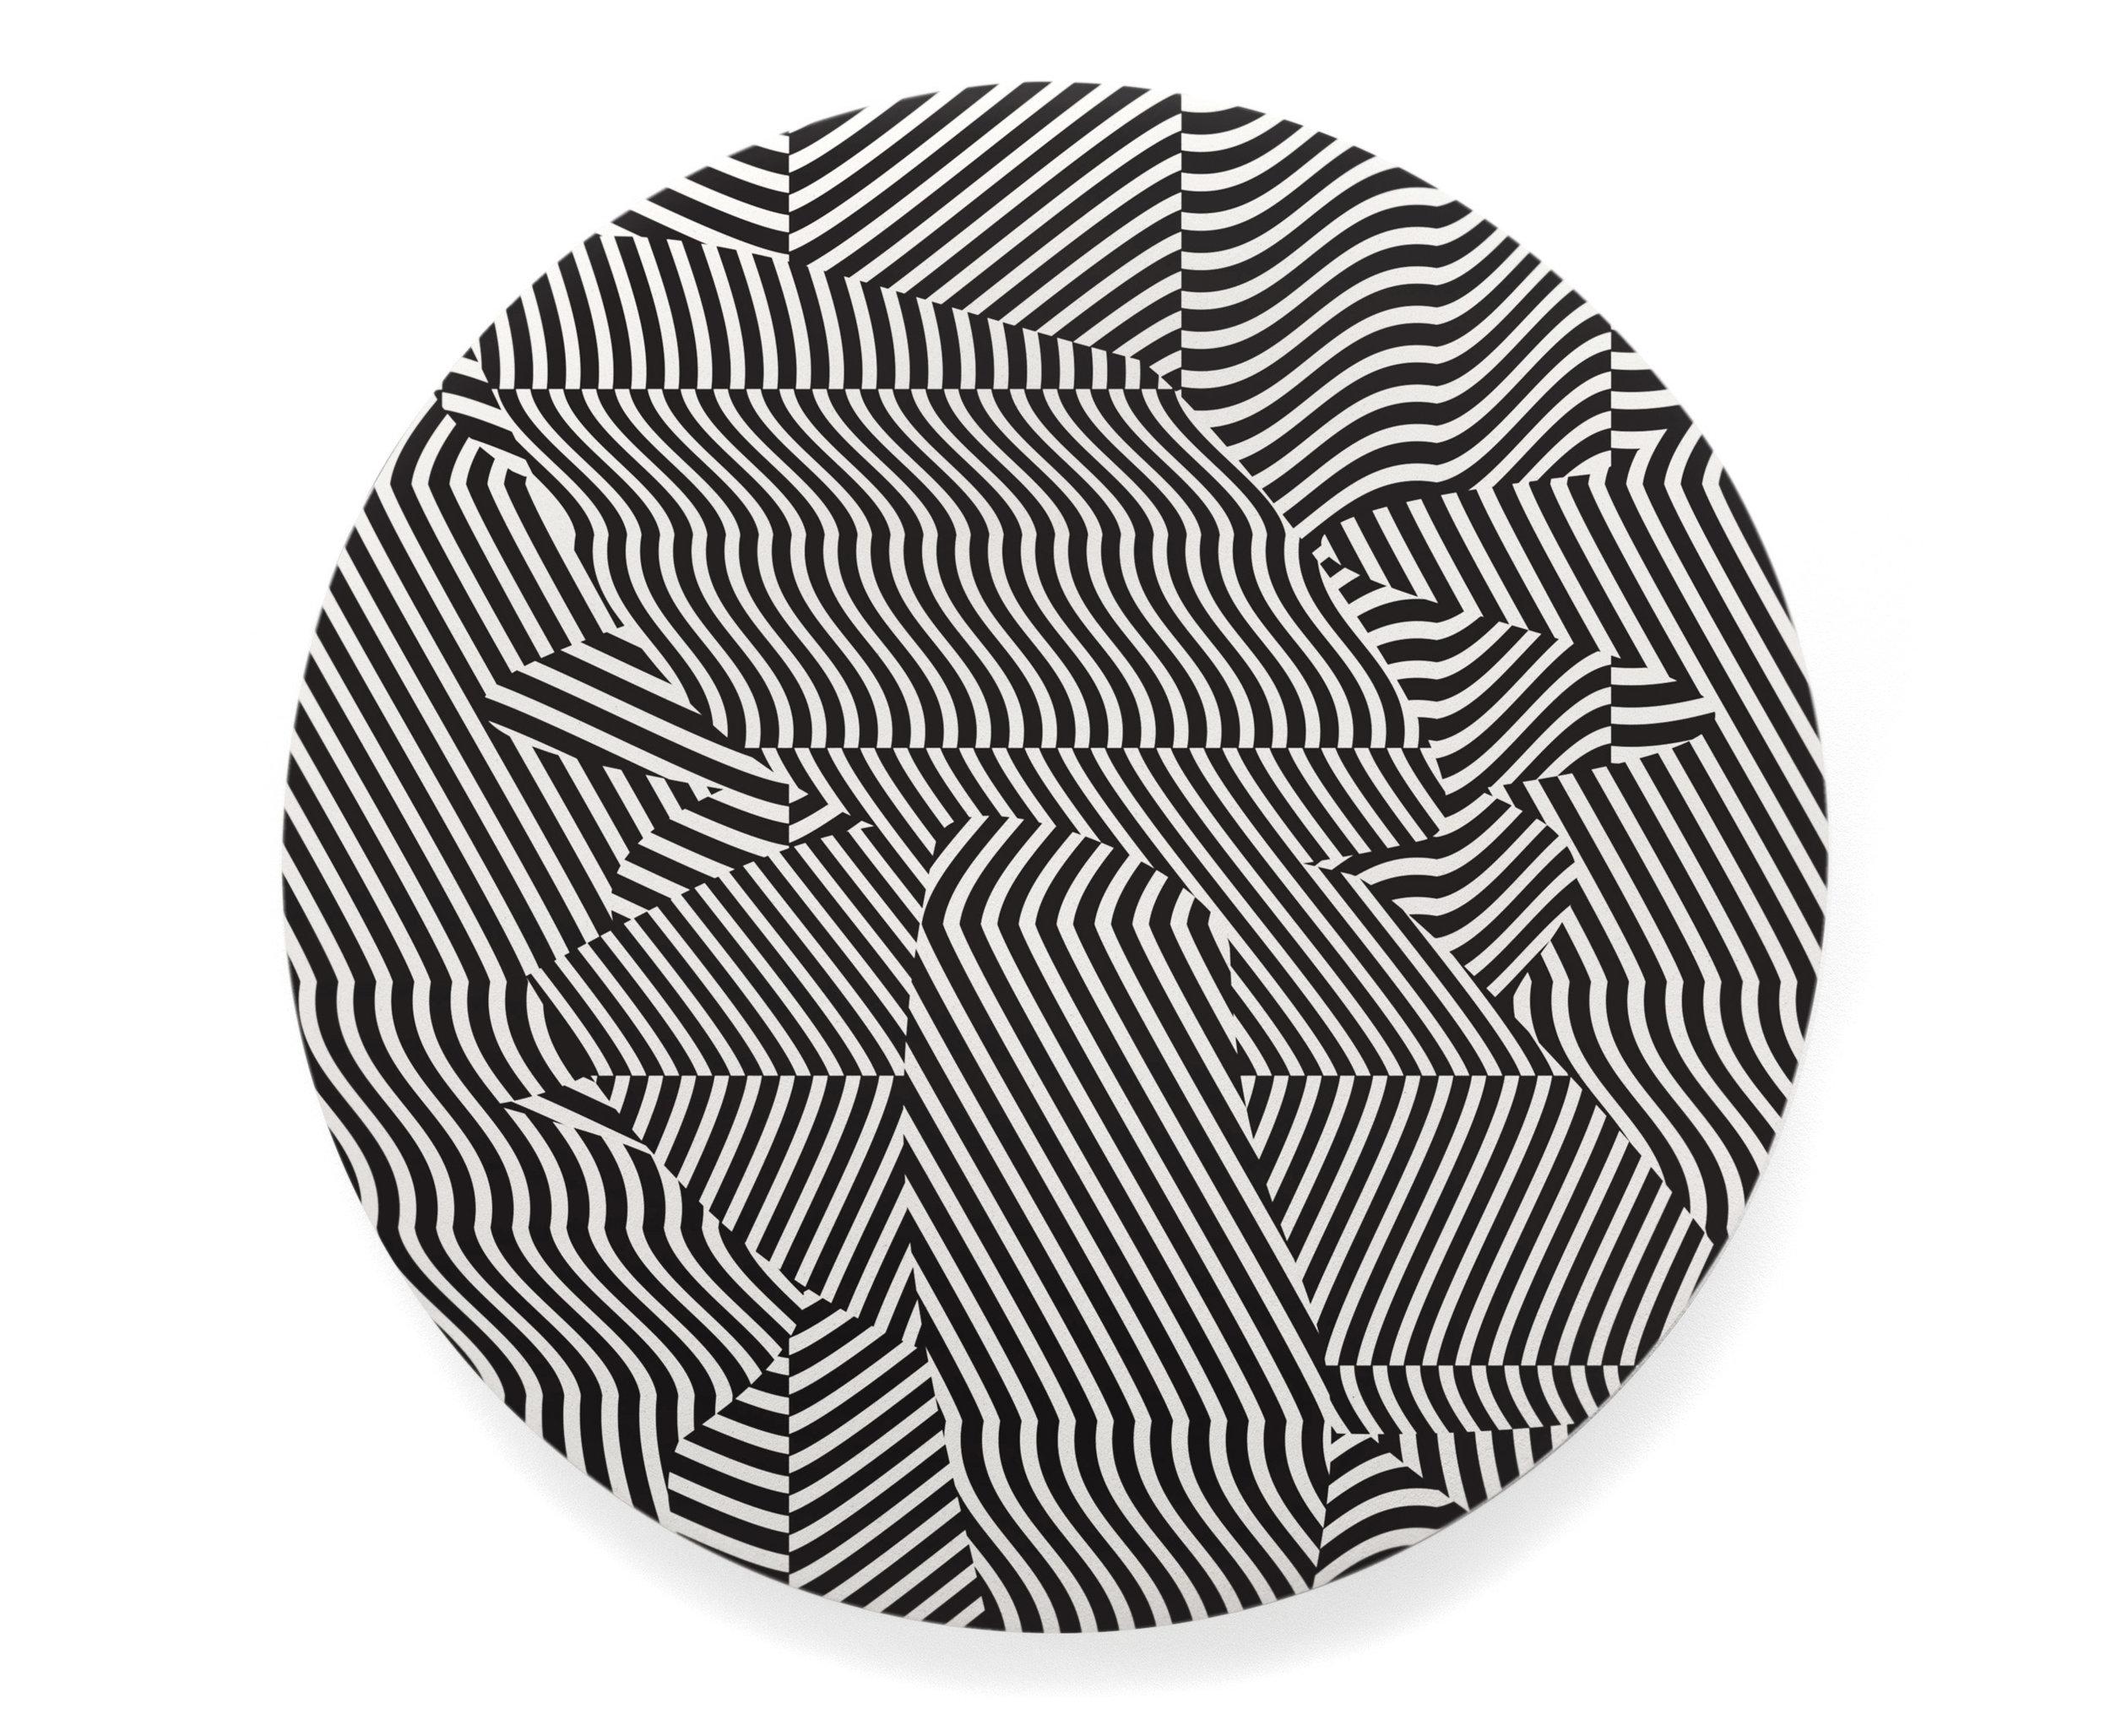 18_OculusIII_150dpi-web.jpg